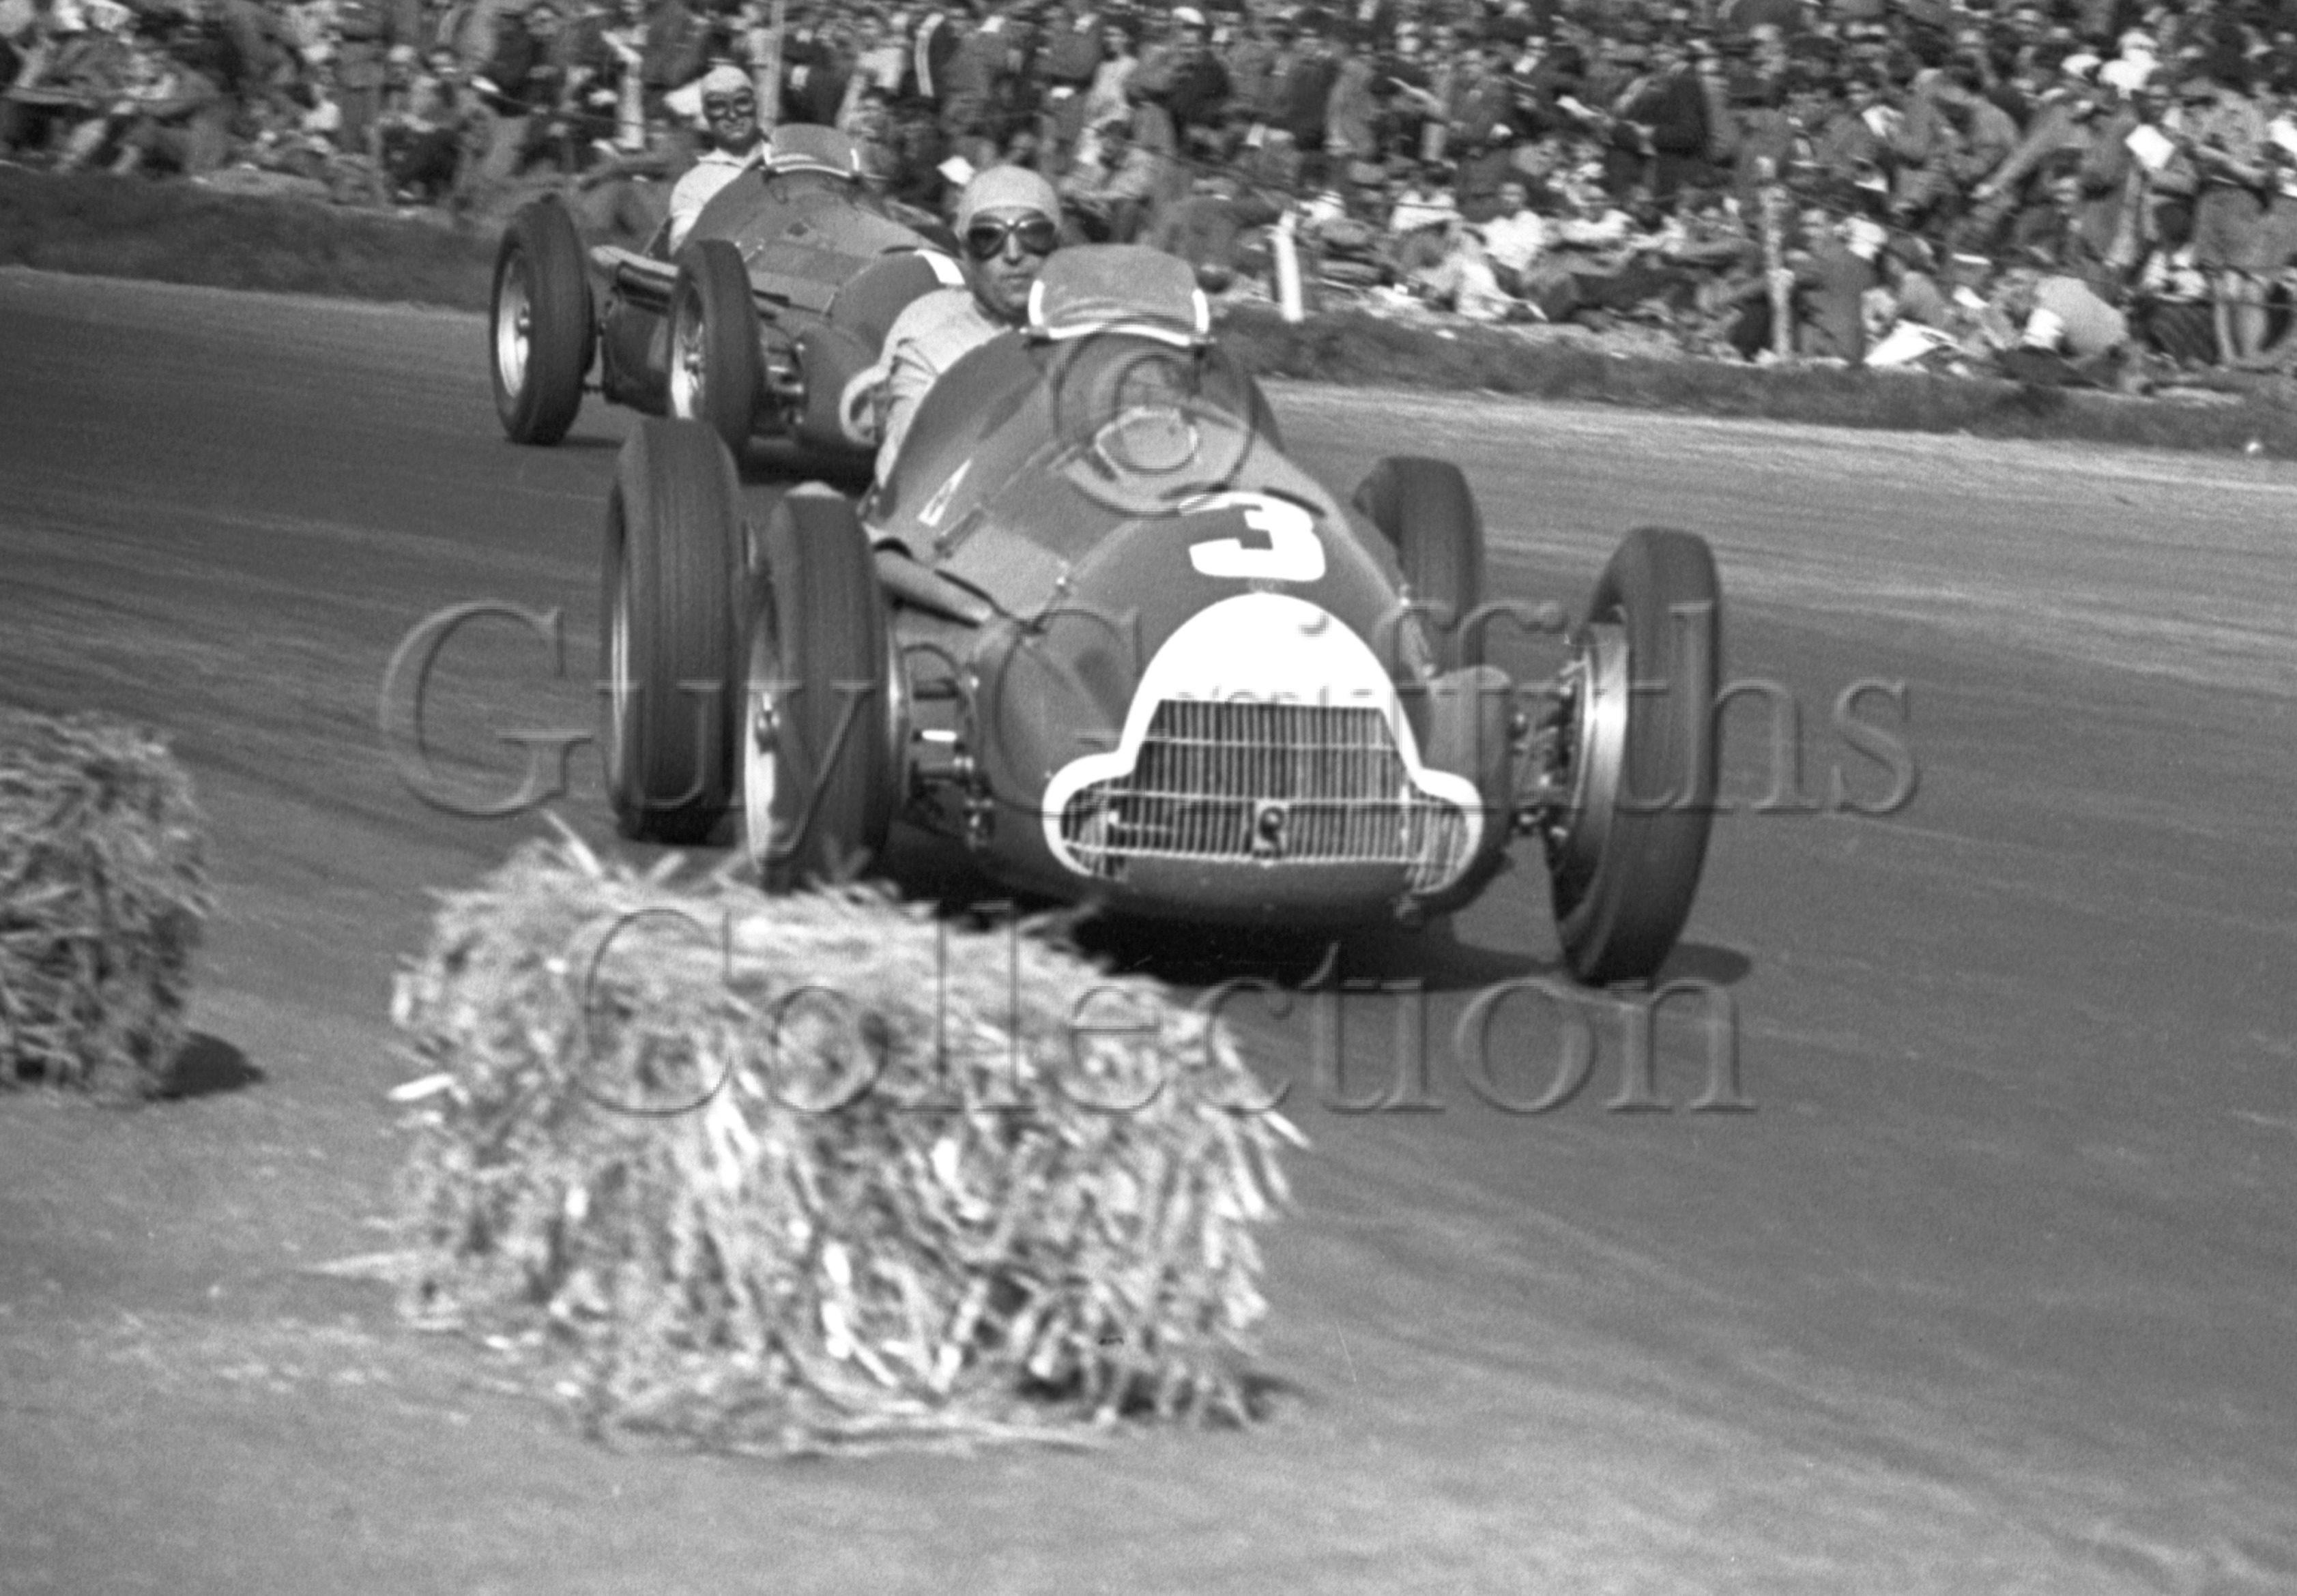 30-133–C-Fagioli–J-Fangio–Alfa-Romeo-158–Silverstone–13-05-1950.jpg - The Guy Griffiths Collection